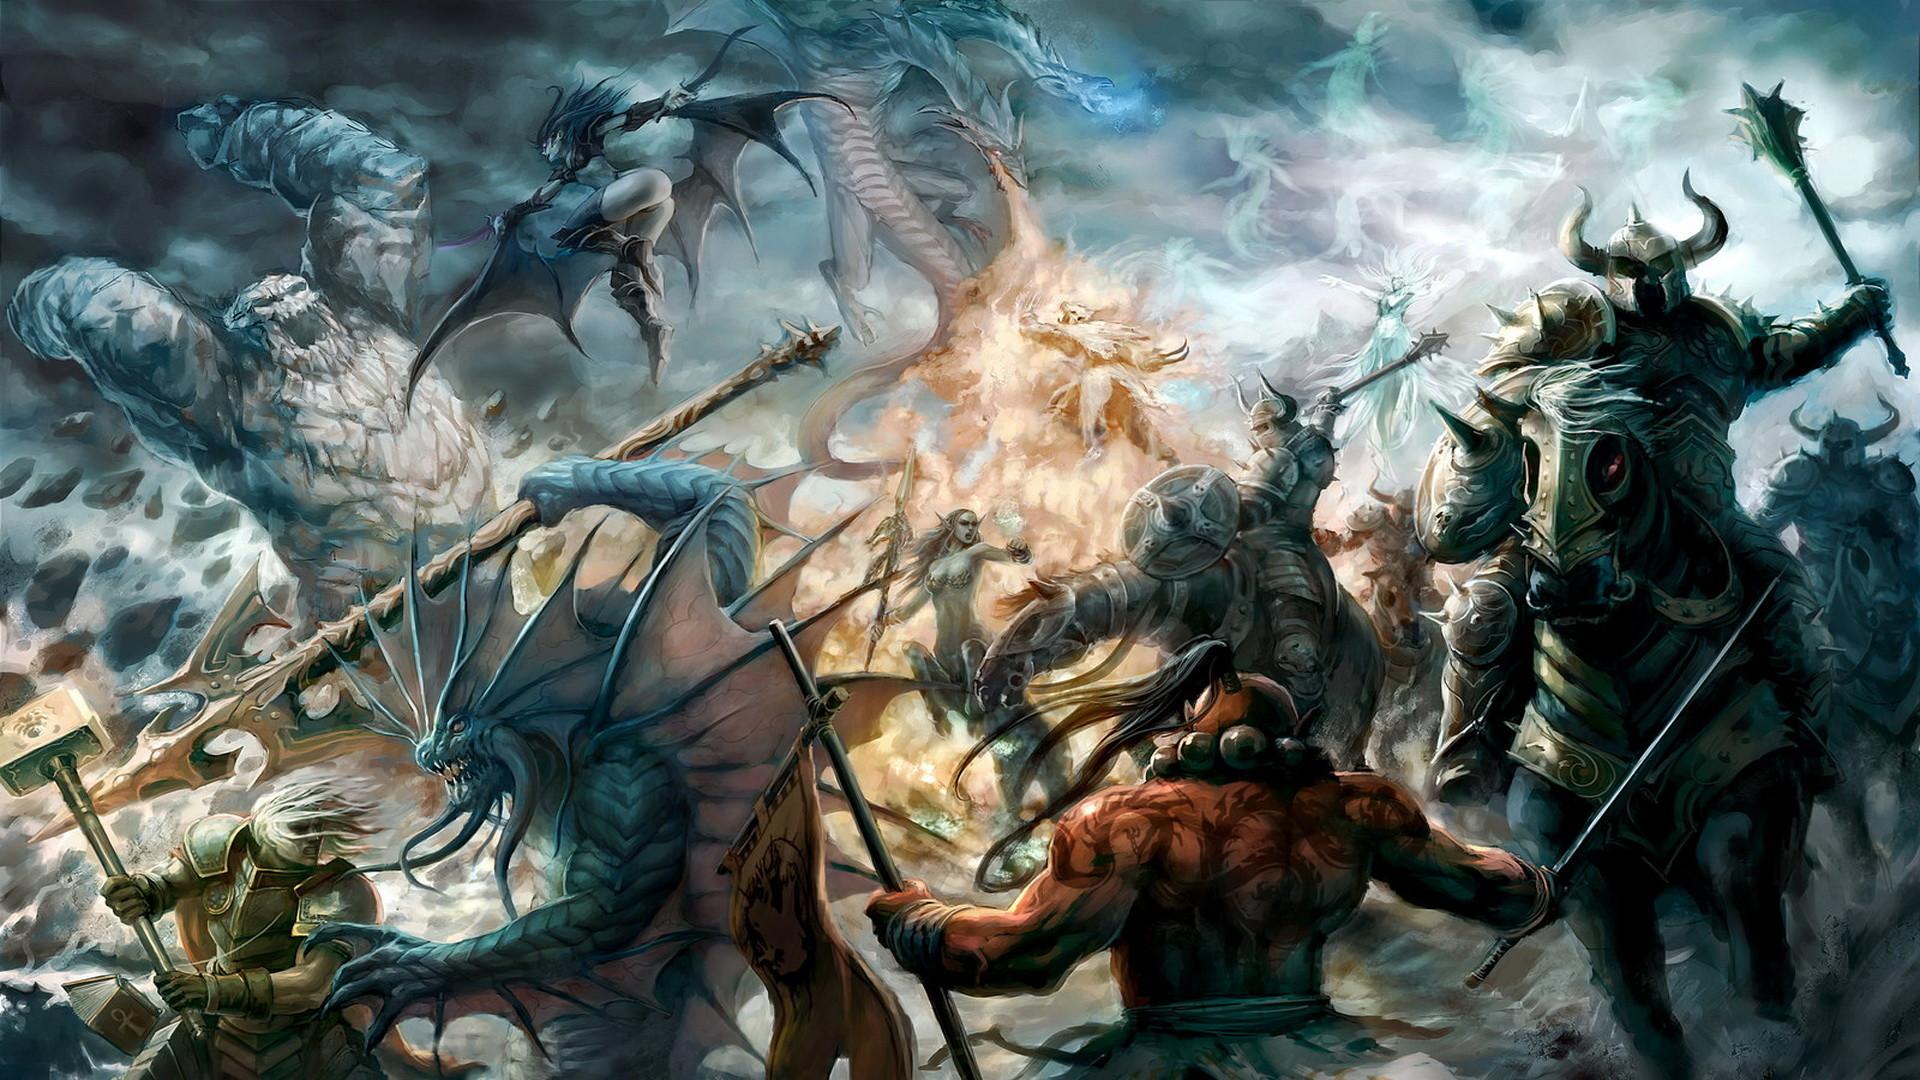 1080p gaming wallpaper (68+ images)